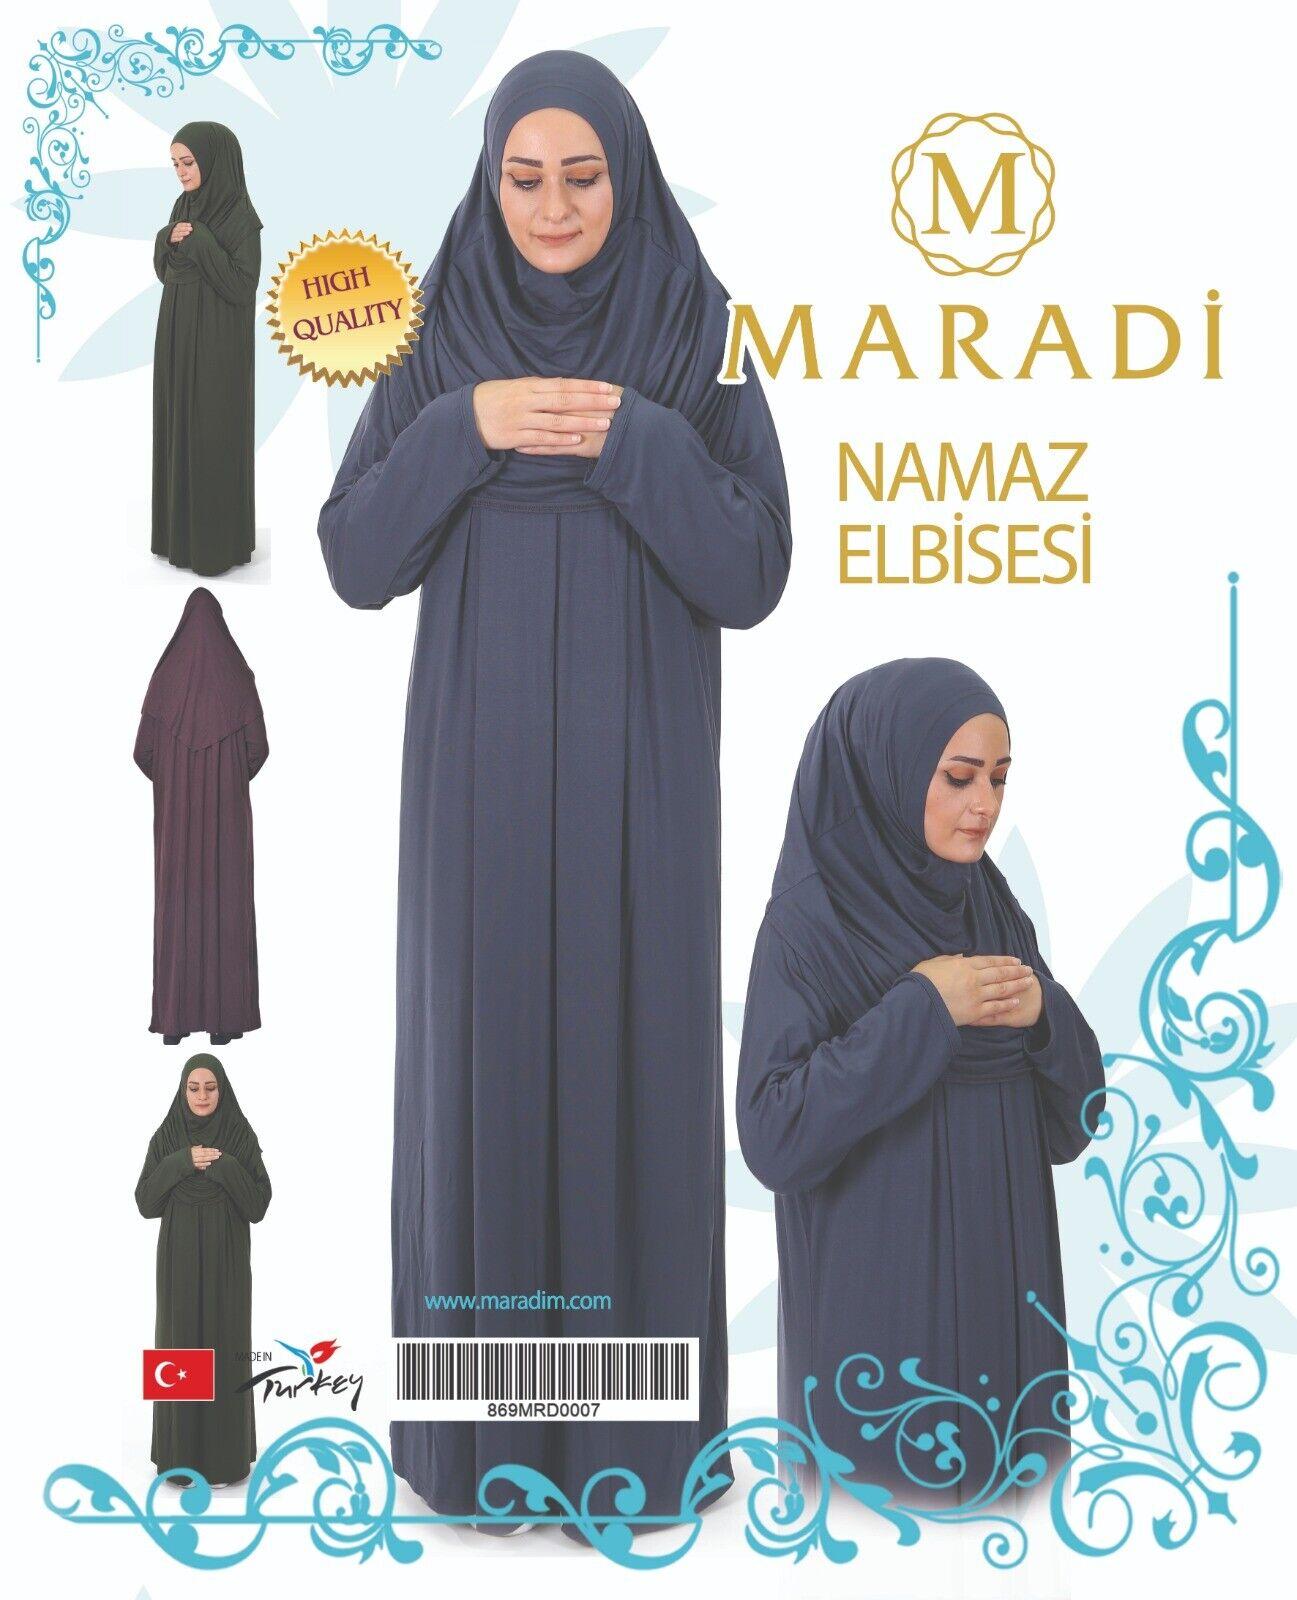 Quality Turkish Turlu Ladies Abaya prayer cloth 1pc standard size with scarf